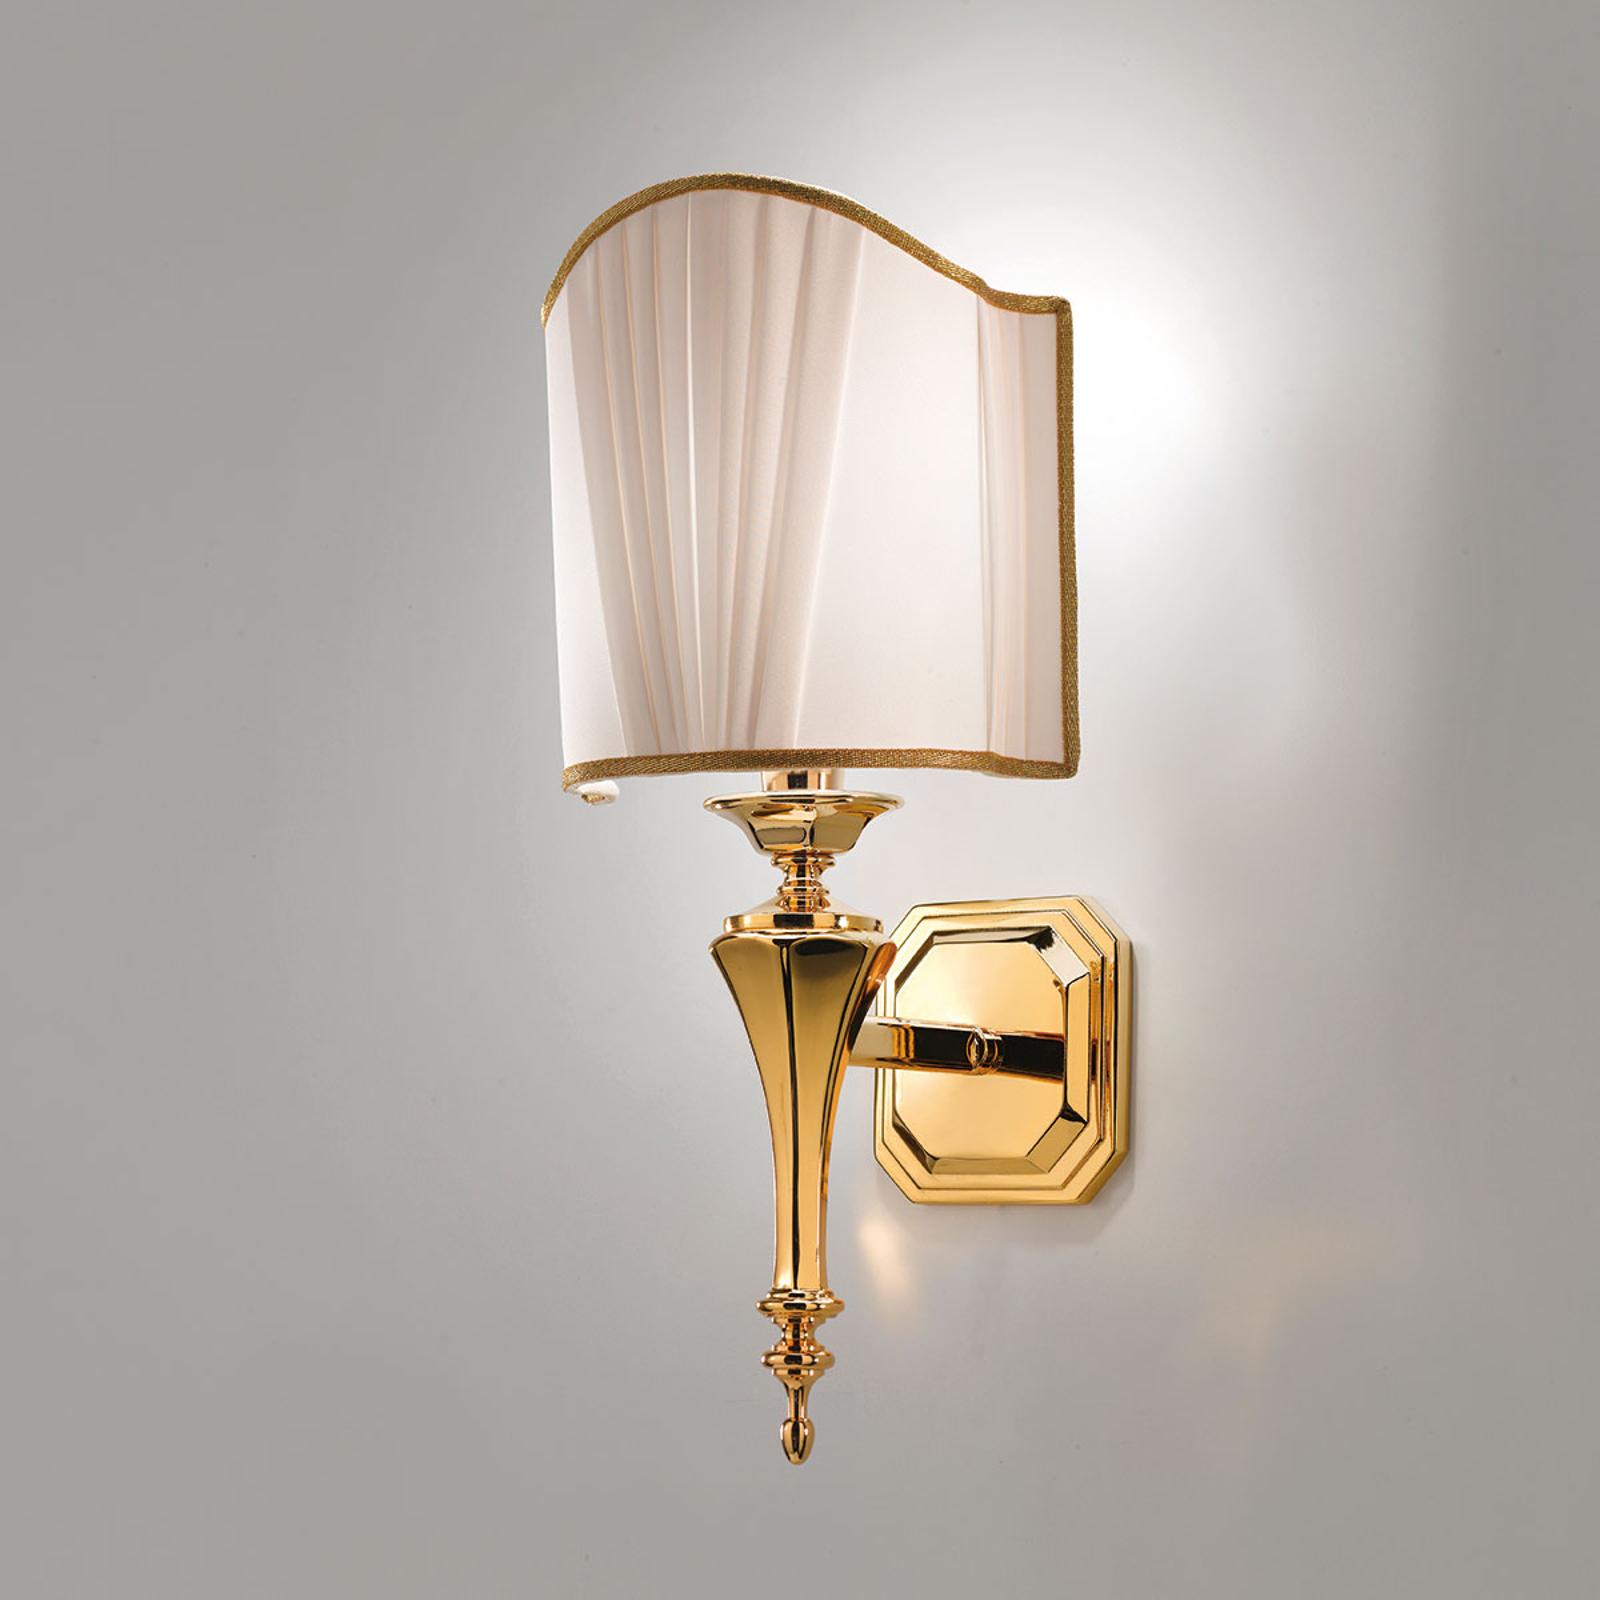 Belle Epoque – ušľachtilé svietidlo v zlatej